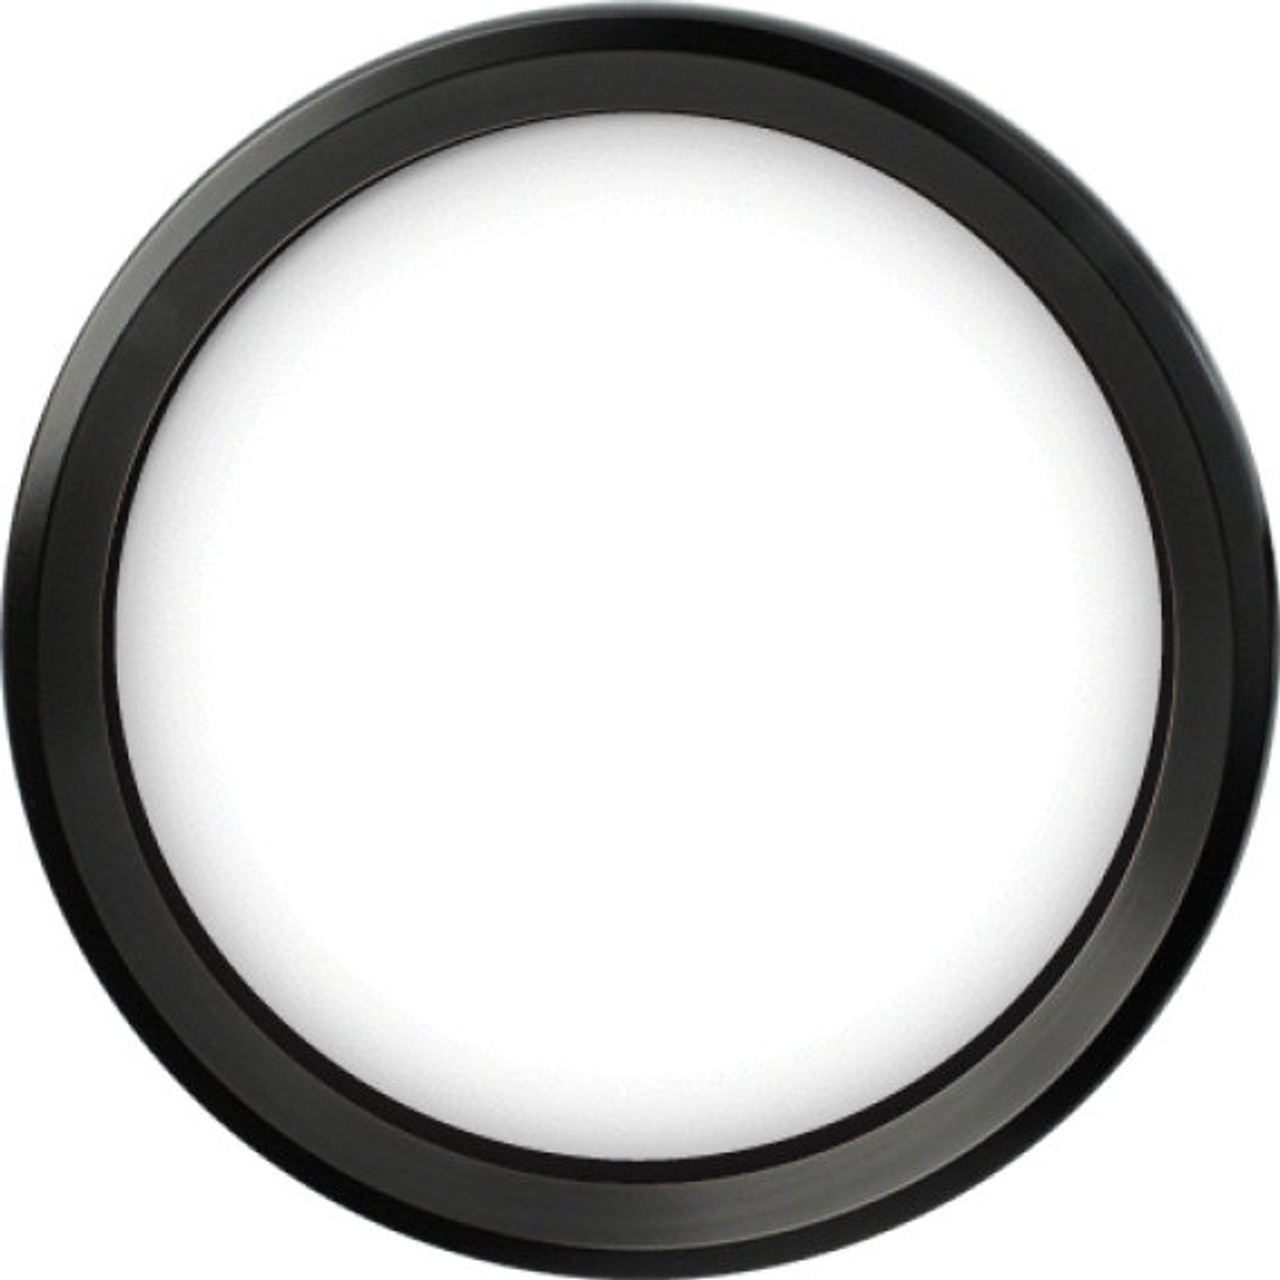 "Revolution Black Replacement Bezel for 4-1/2"" gauge"